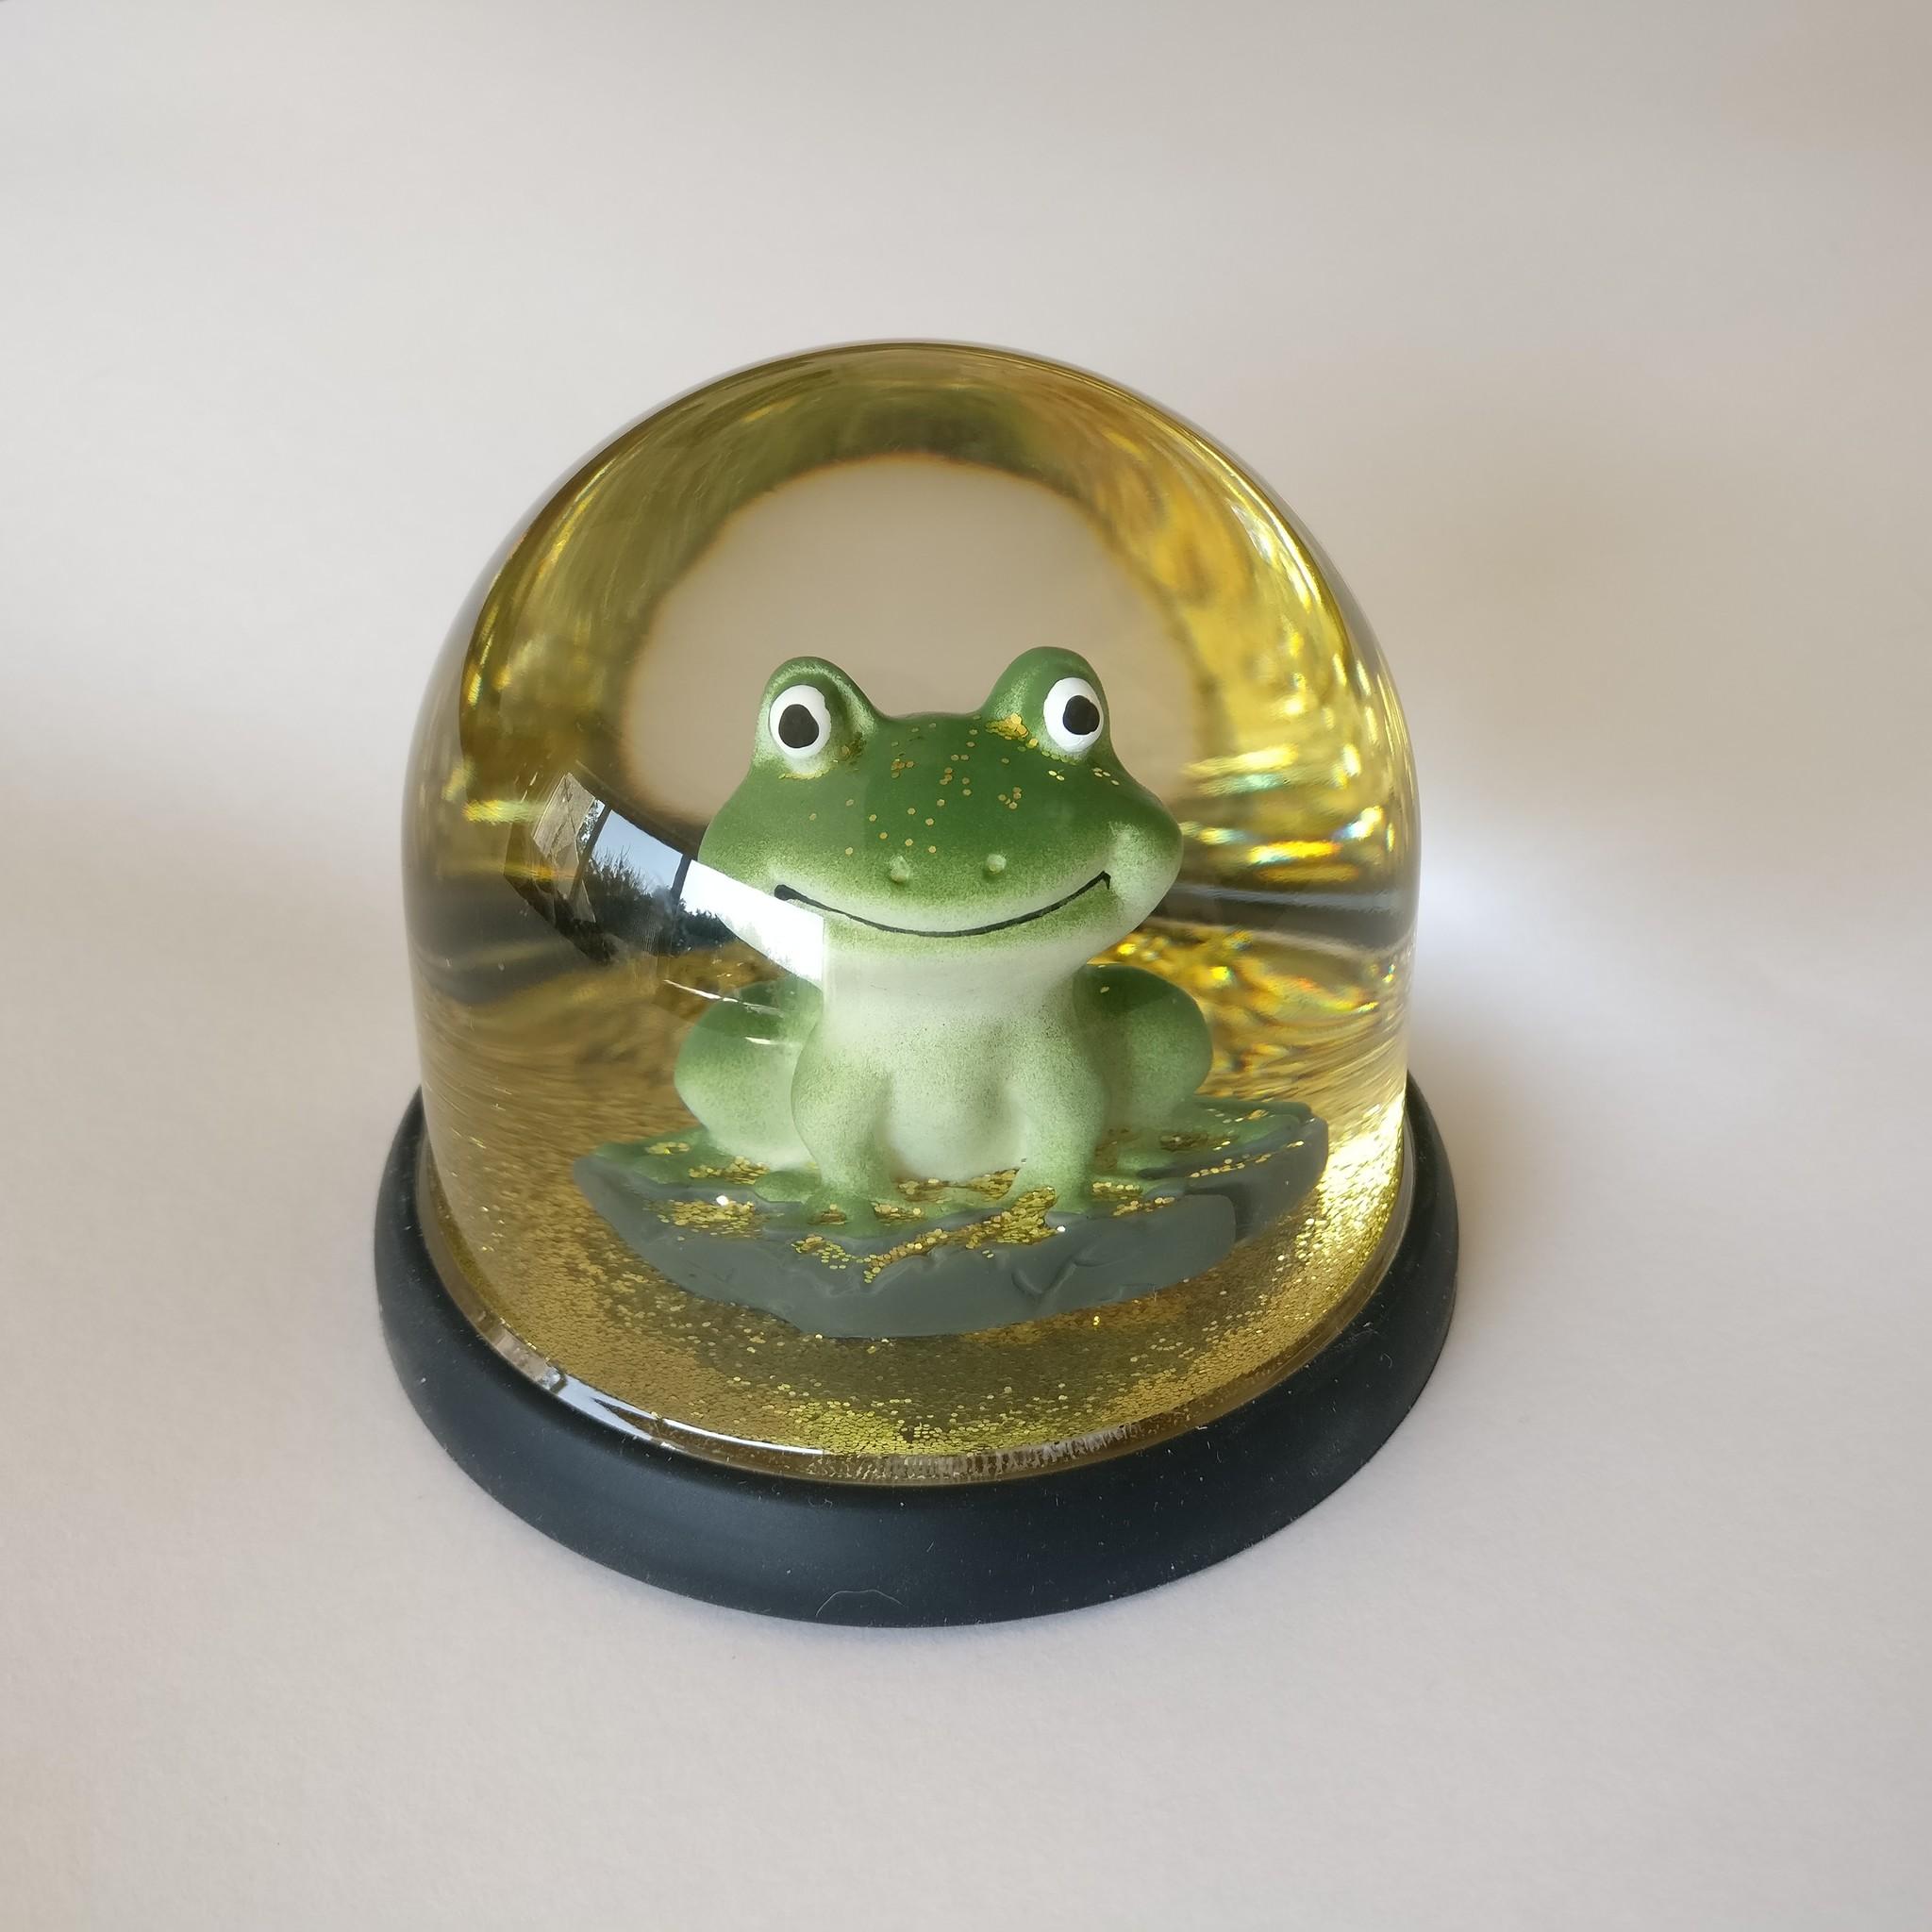 Eline Snel Anillo de protección de silicona para bola de cristal con ranita